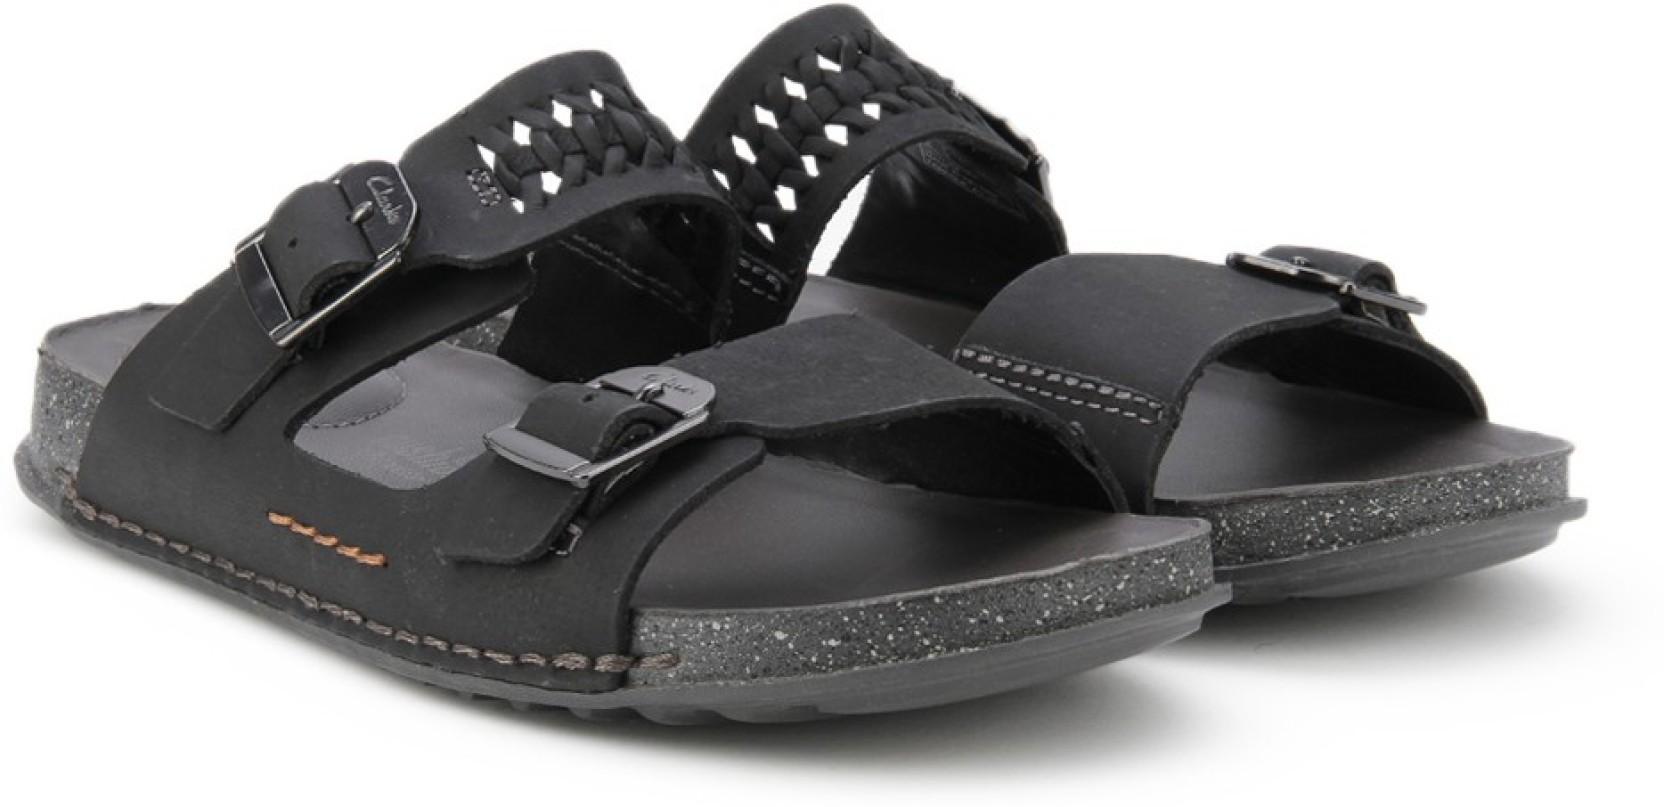 5de9ddf4eaee Clarks Men Black Nubuck Sandals - Buy Black Nubuck Color Clarks Men ...